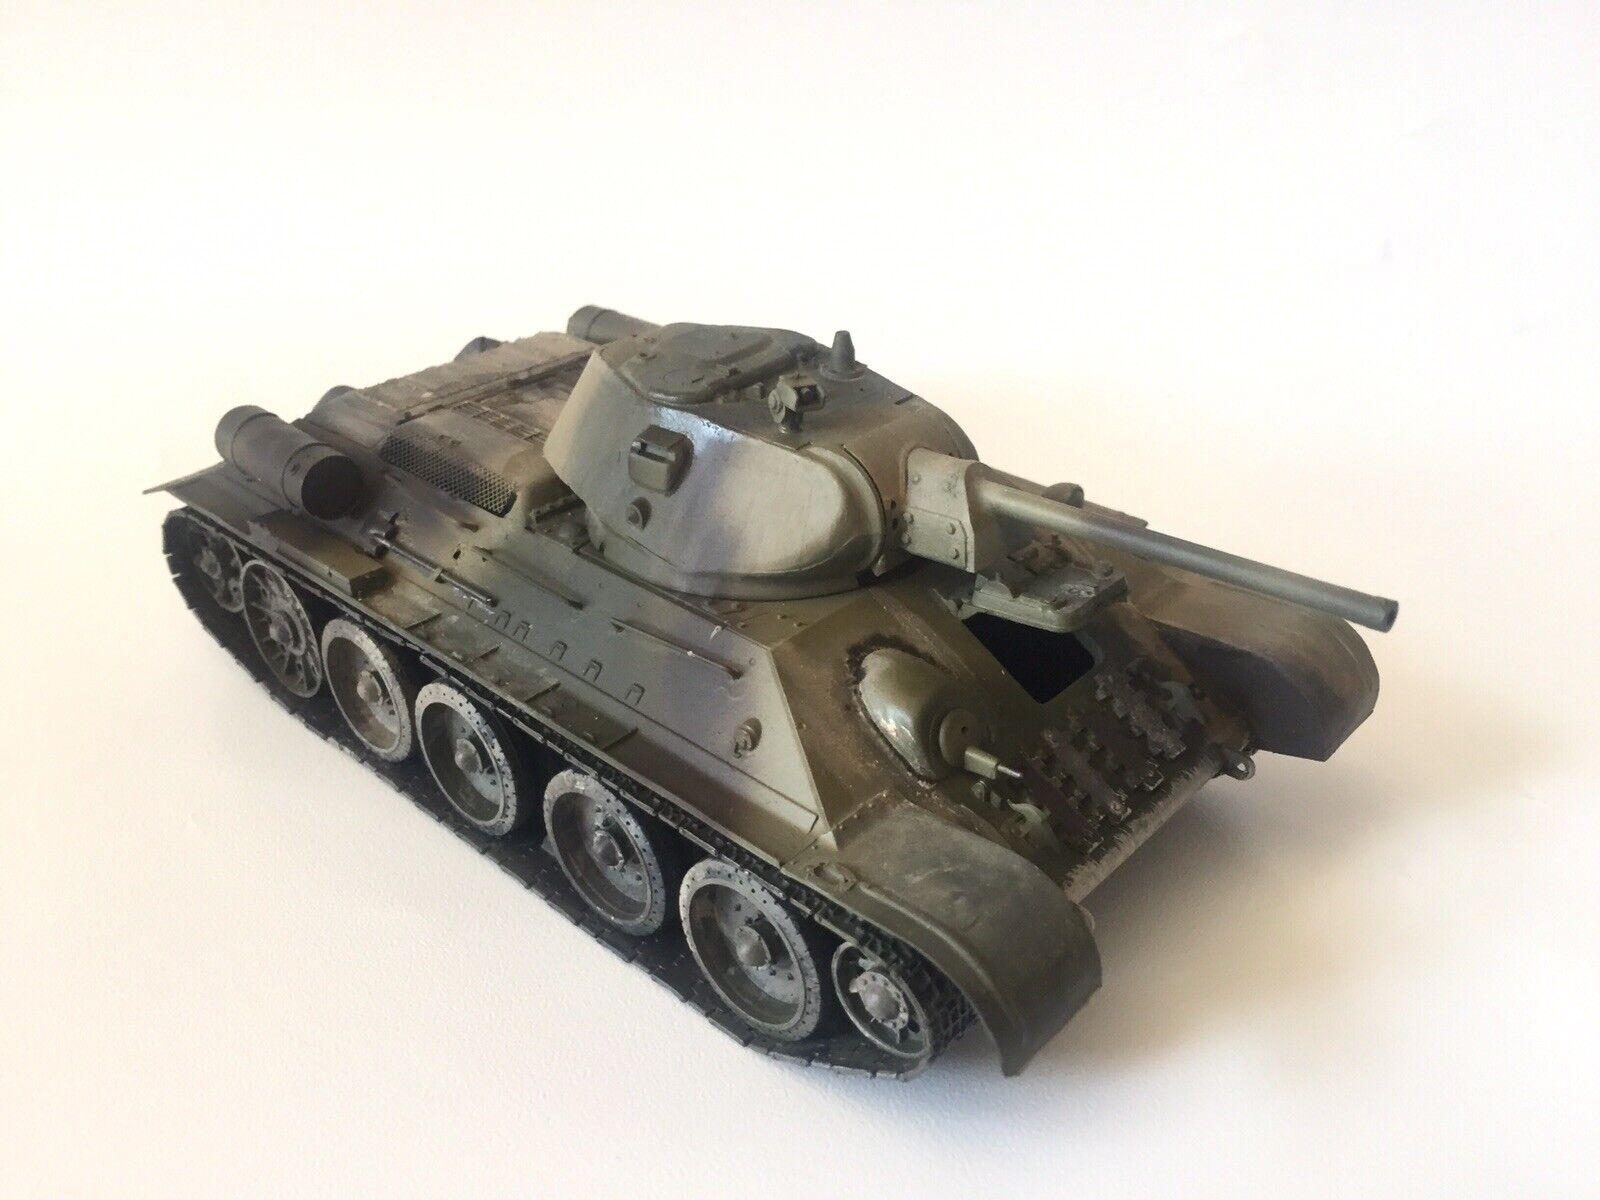 T-34 76  Mod.1940 Russian Tank WWII 1 35 Pro-built, Painted And Weatherouge  70% de réduction